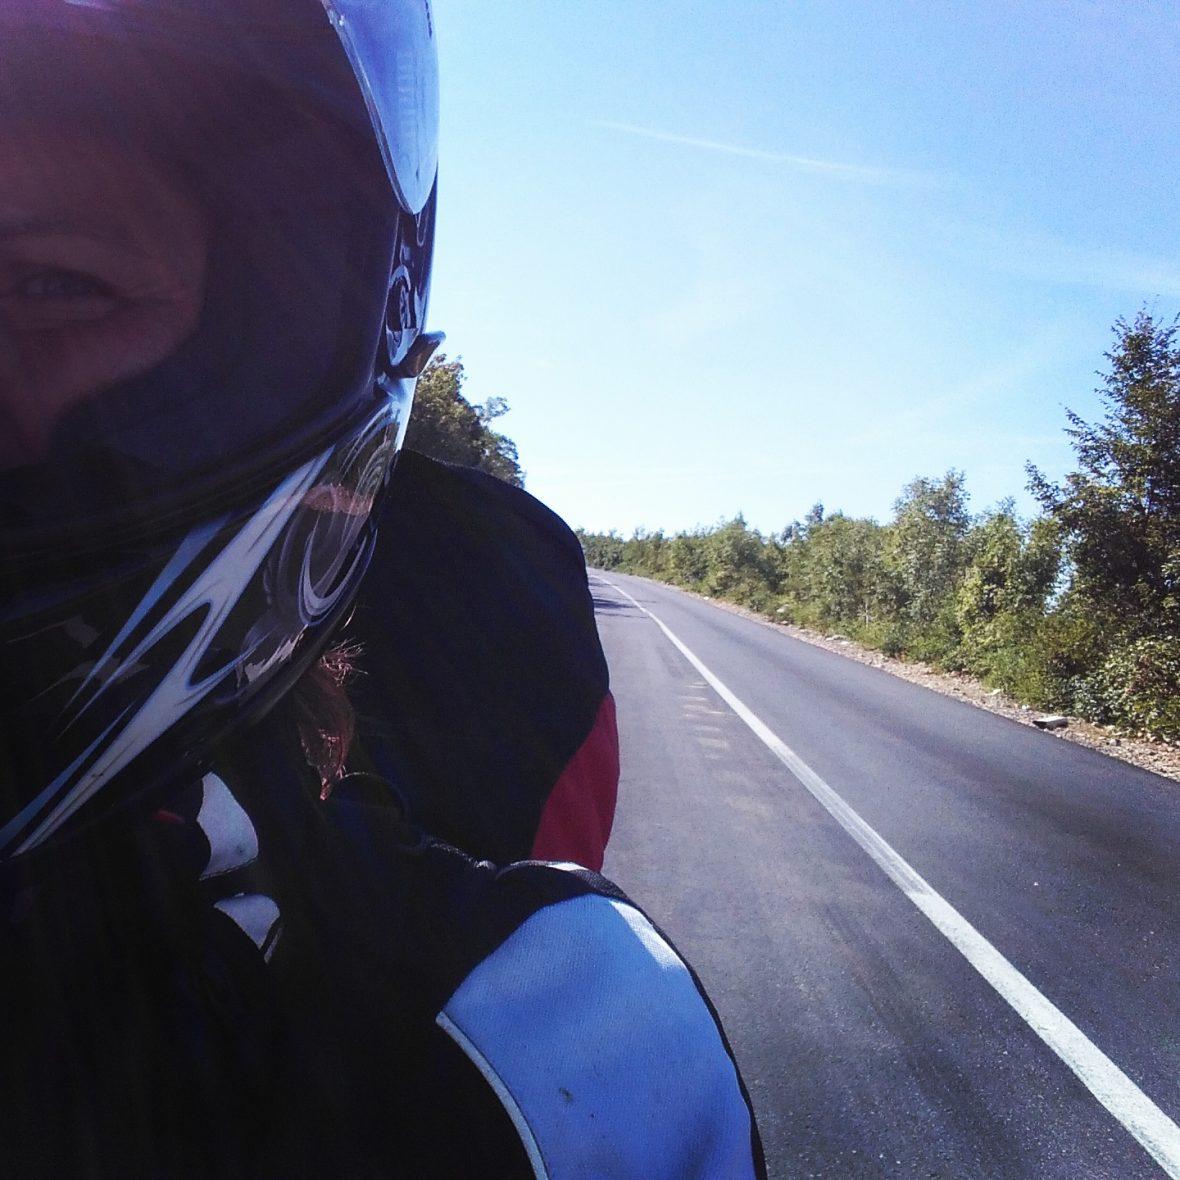 Selfie, Straße nach hinten fotografiert (leer)